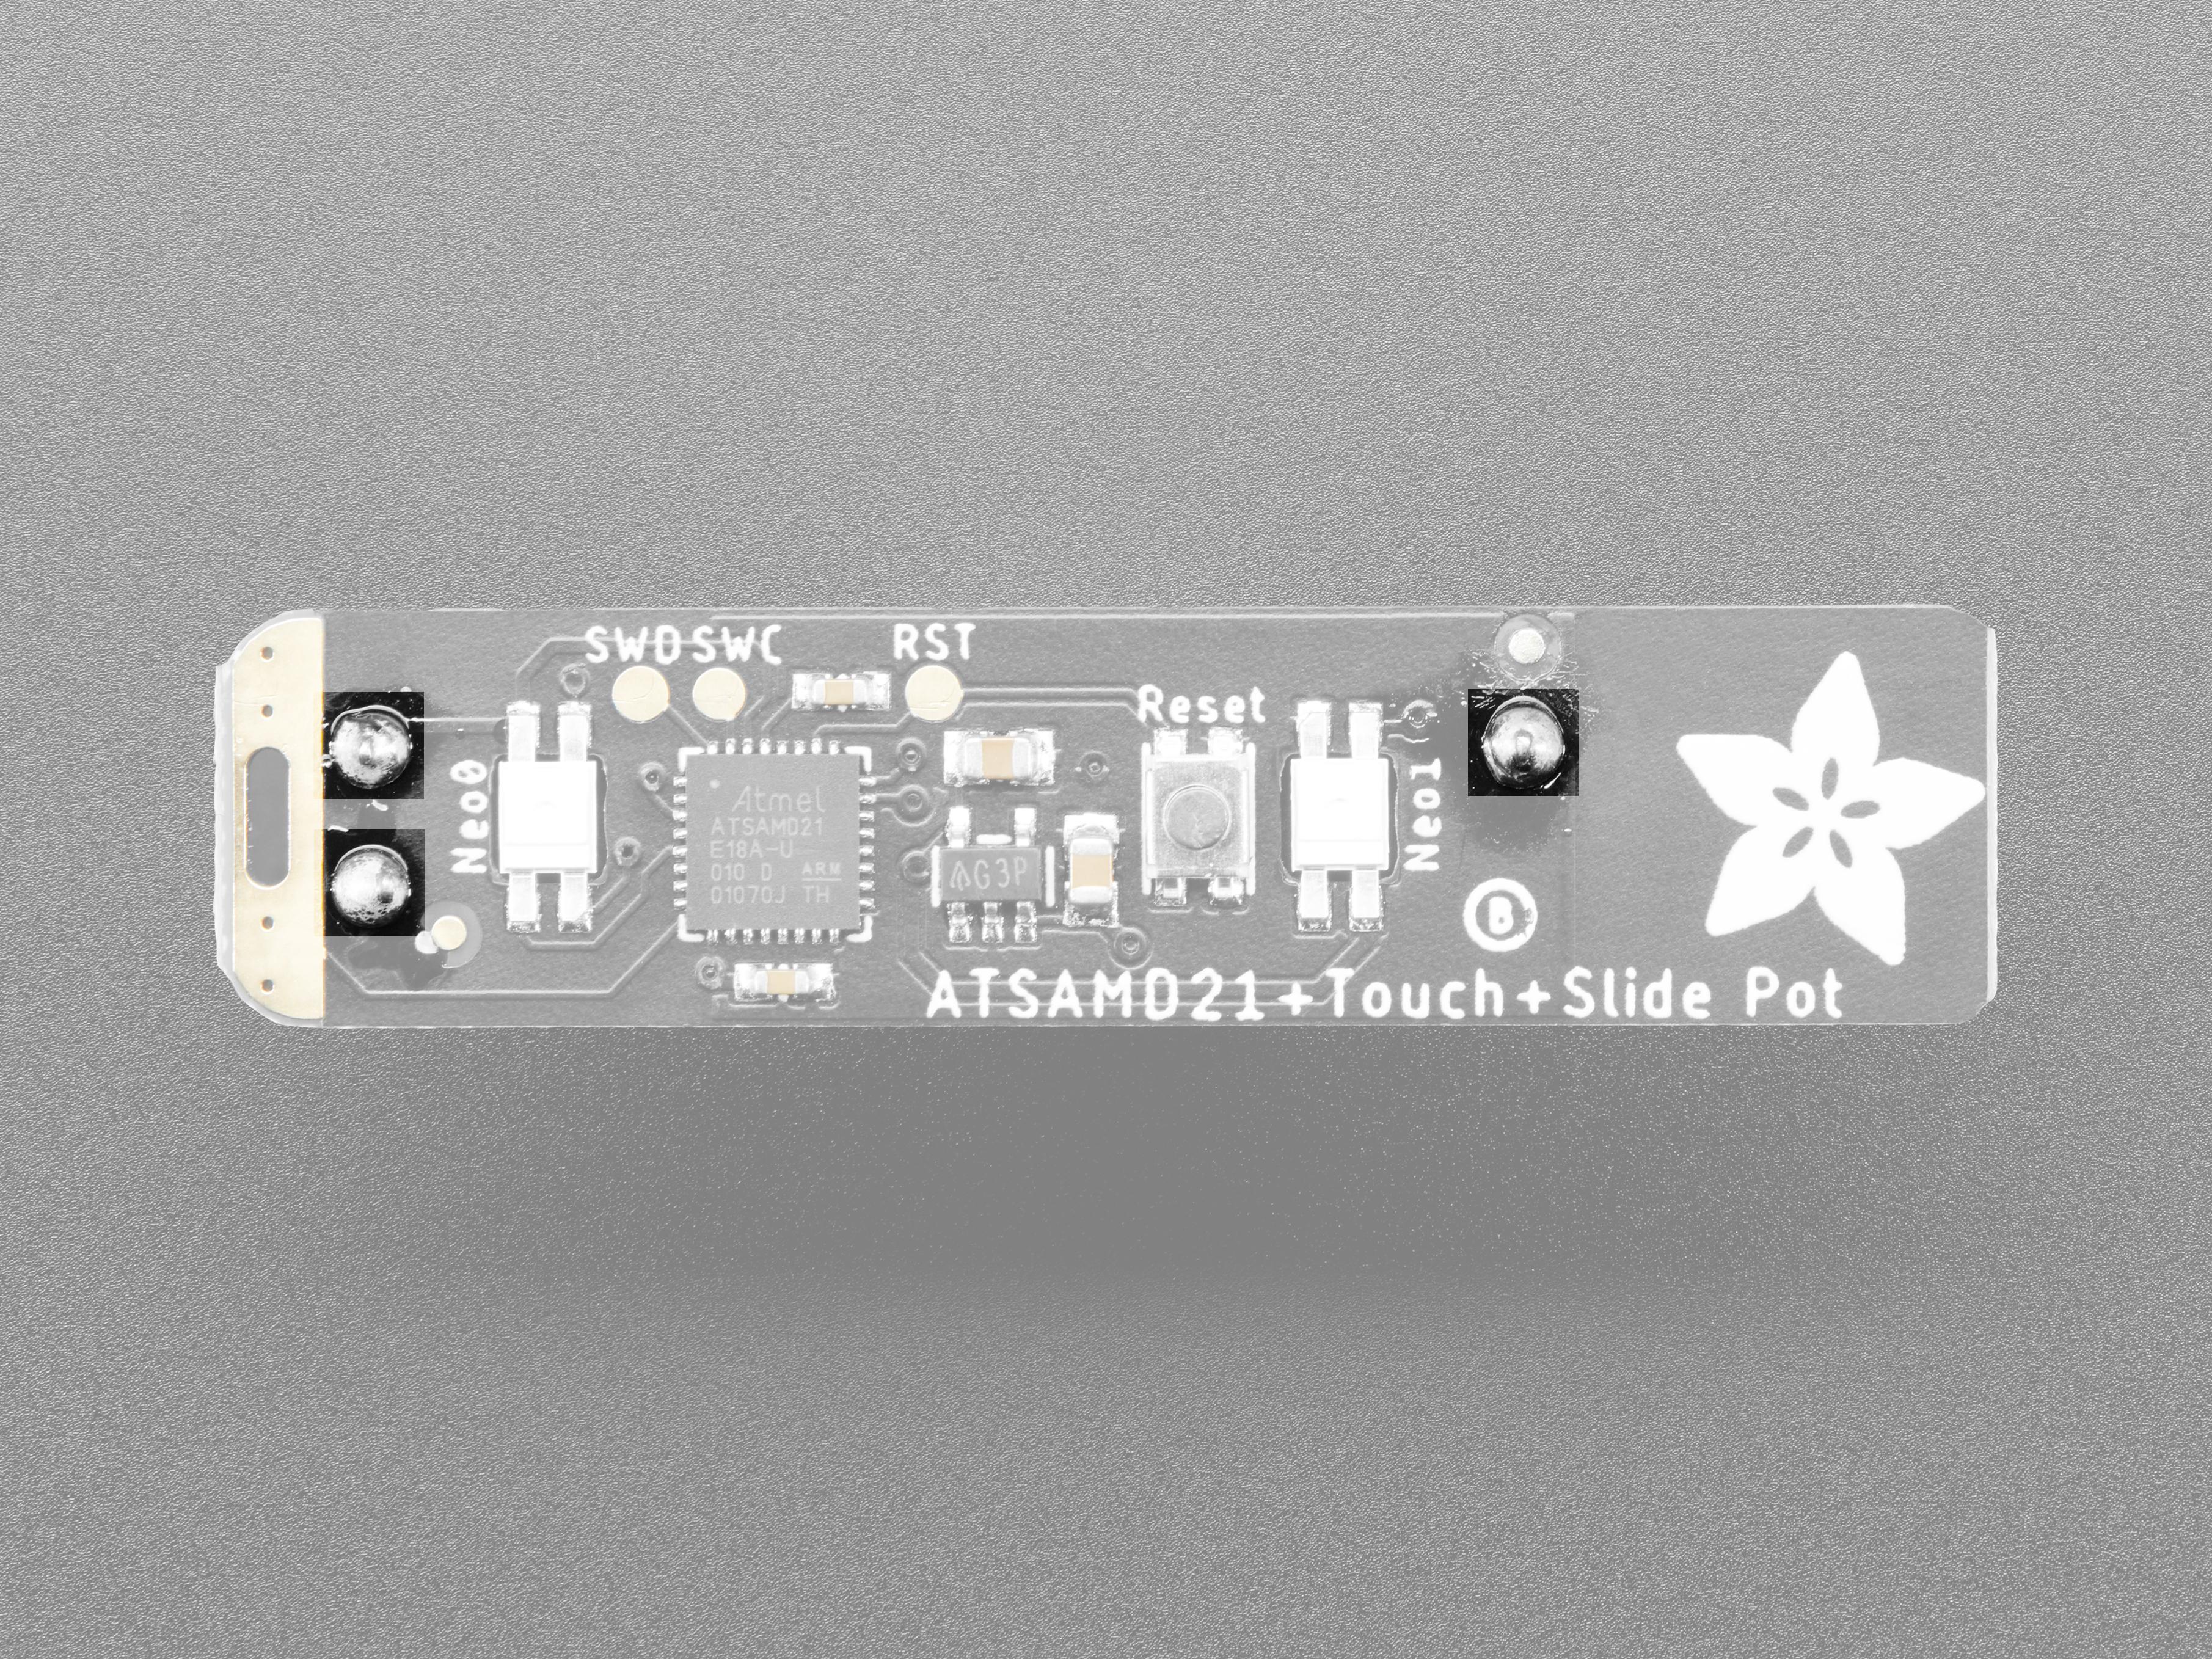 adafruit_products_ST_pinouts_potentiometer_pins.jpg